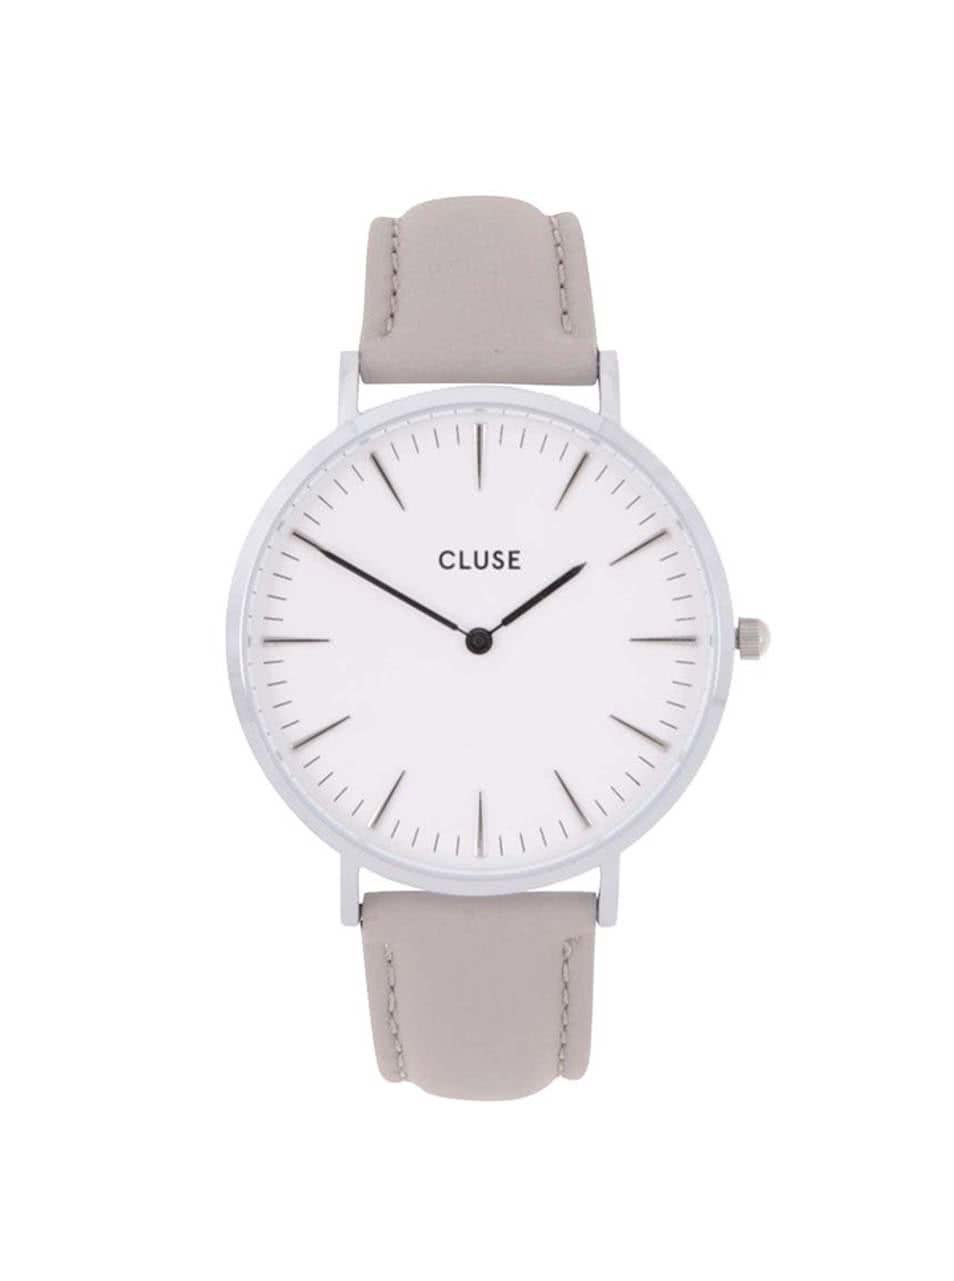 Bílo-šedé dámské hodinky s koženým páskem CLUSE La Bohème Silver ... a2137ca99d